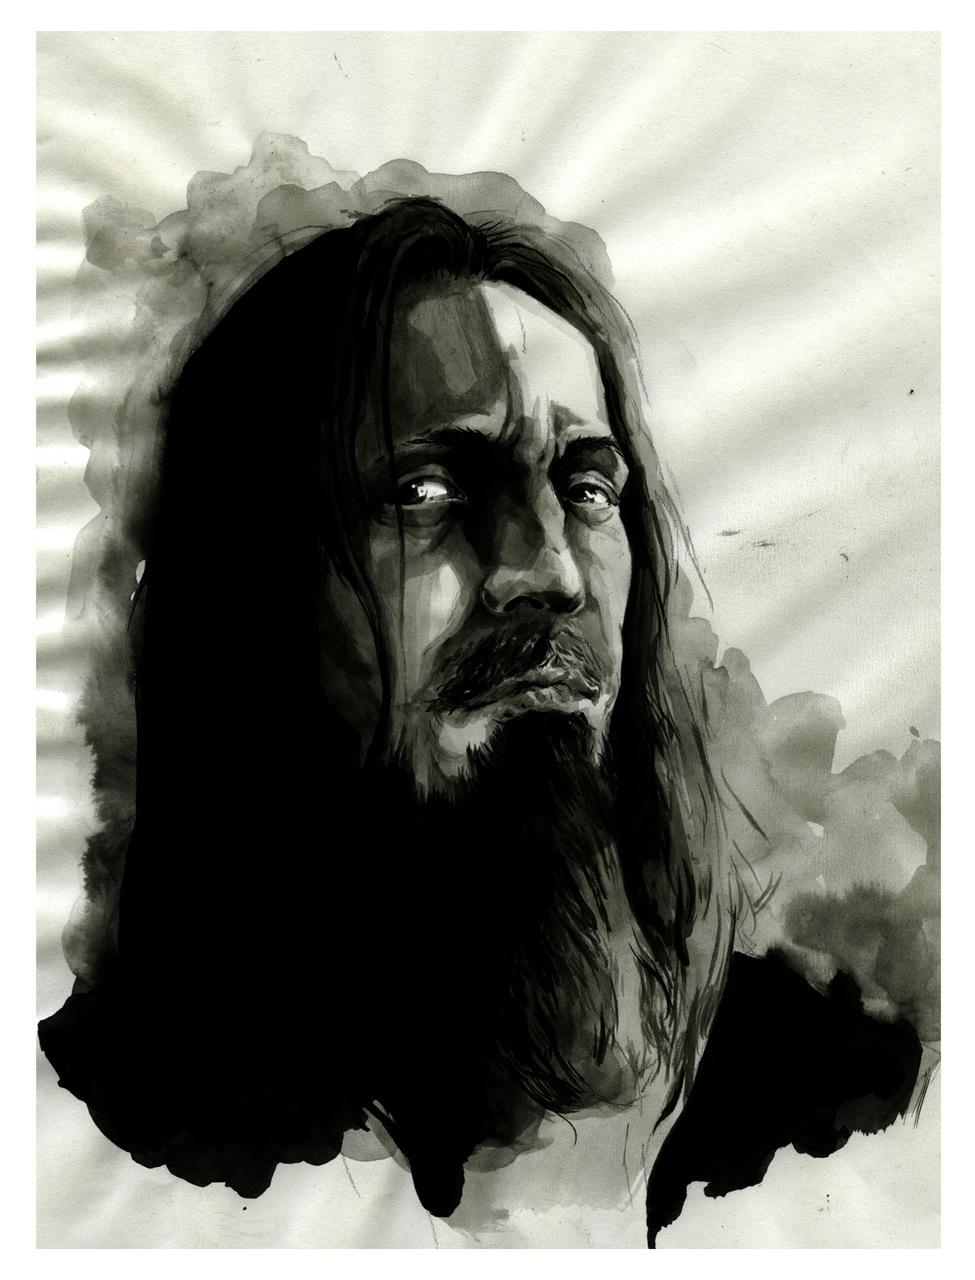 Fenriz, from Darkthrone